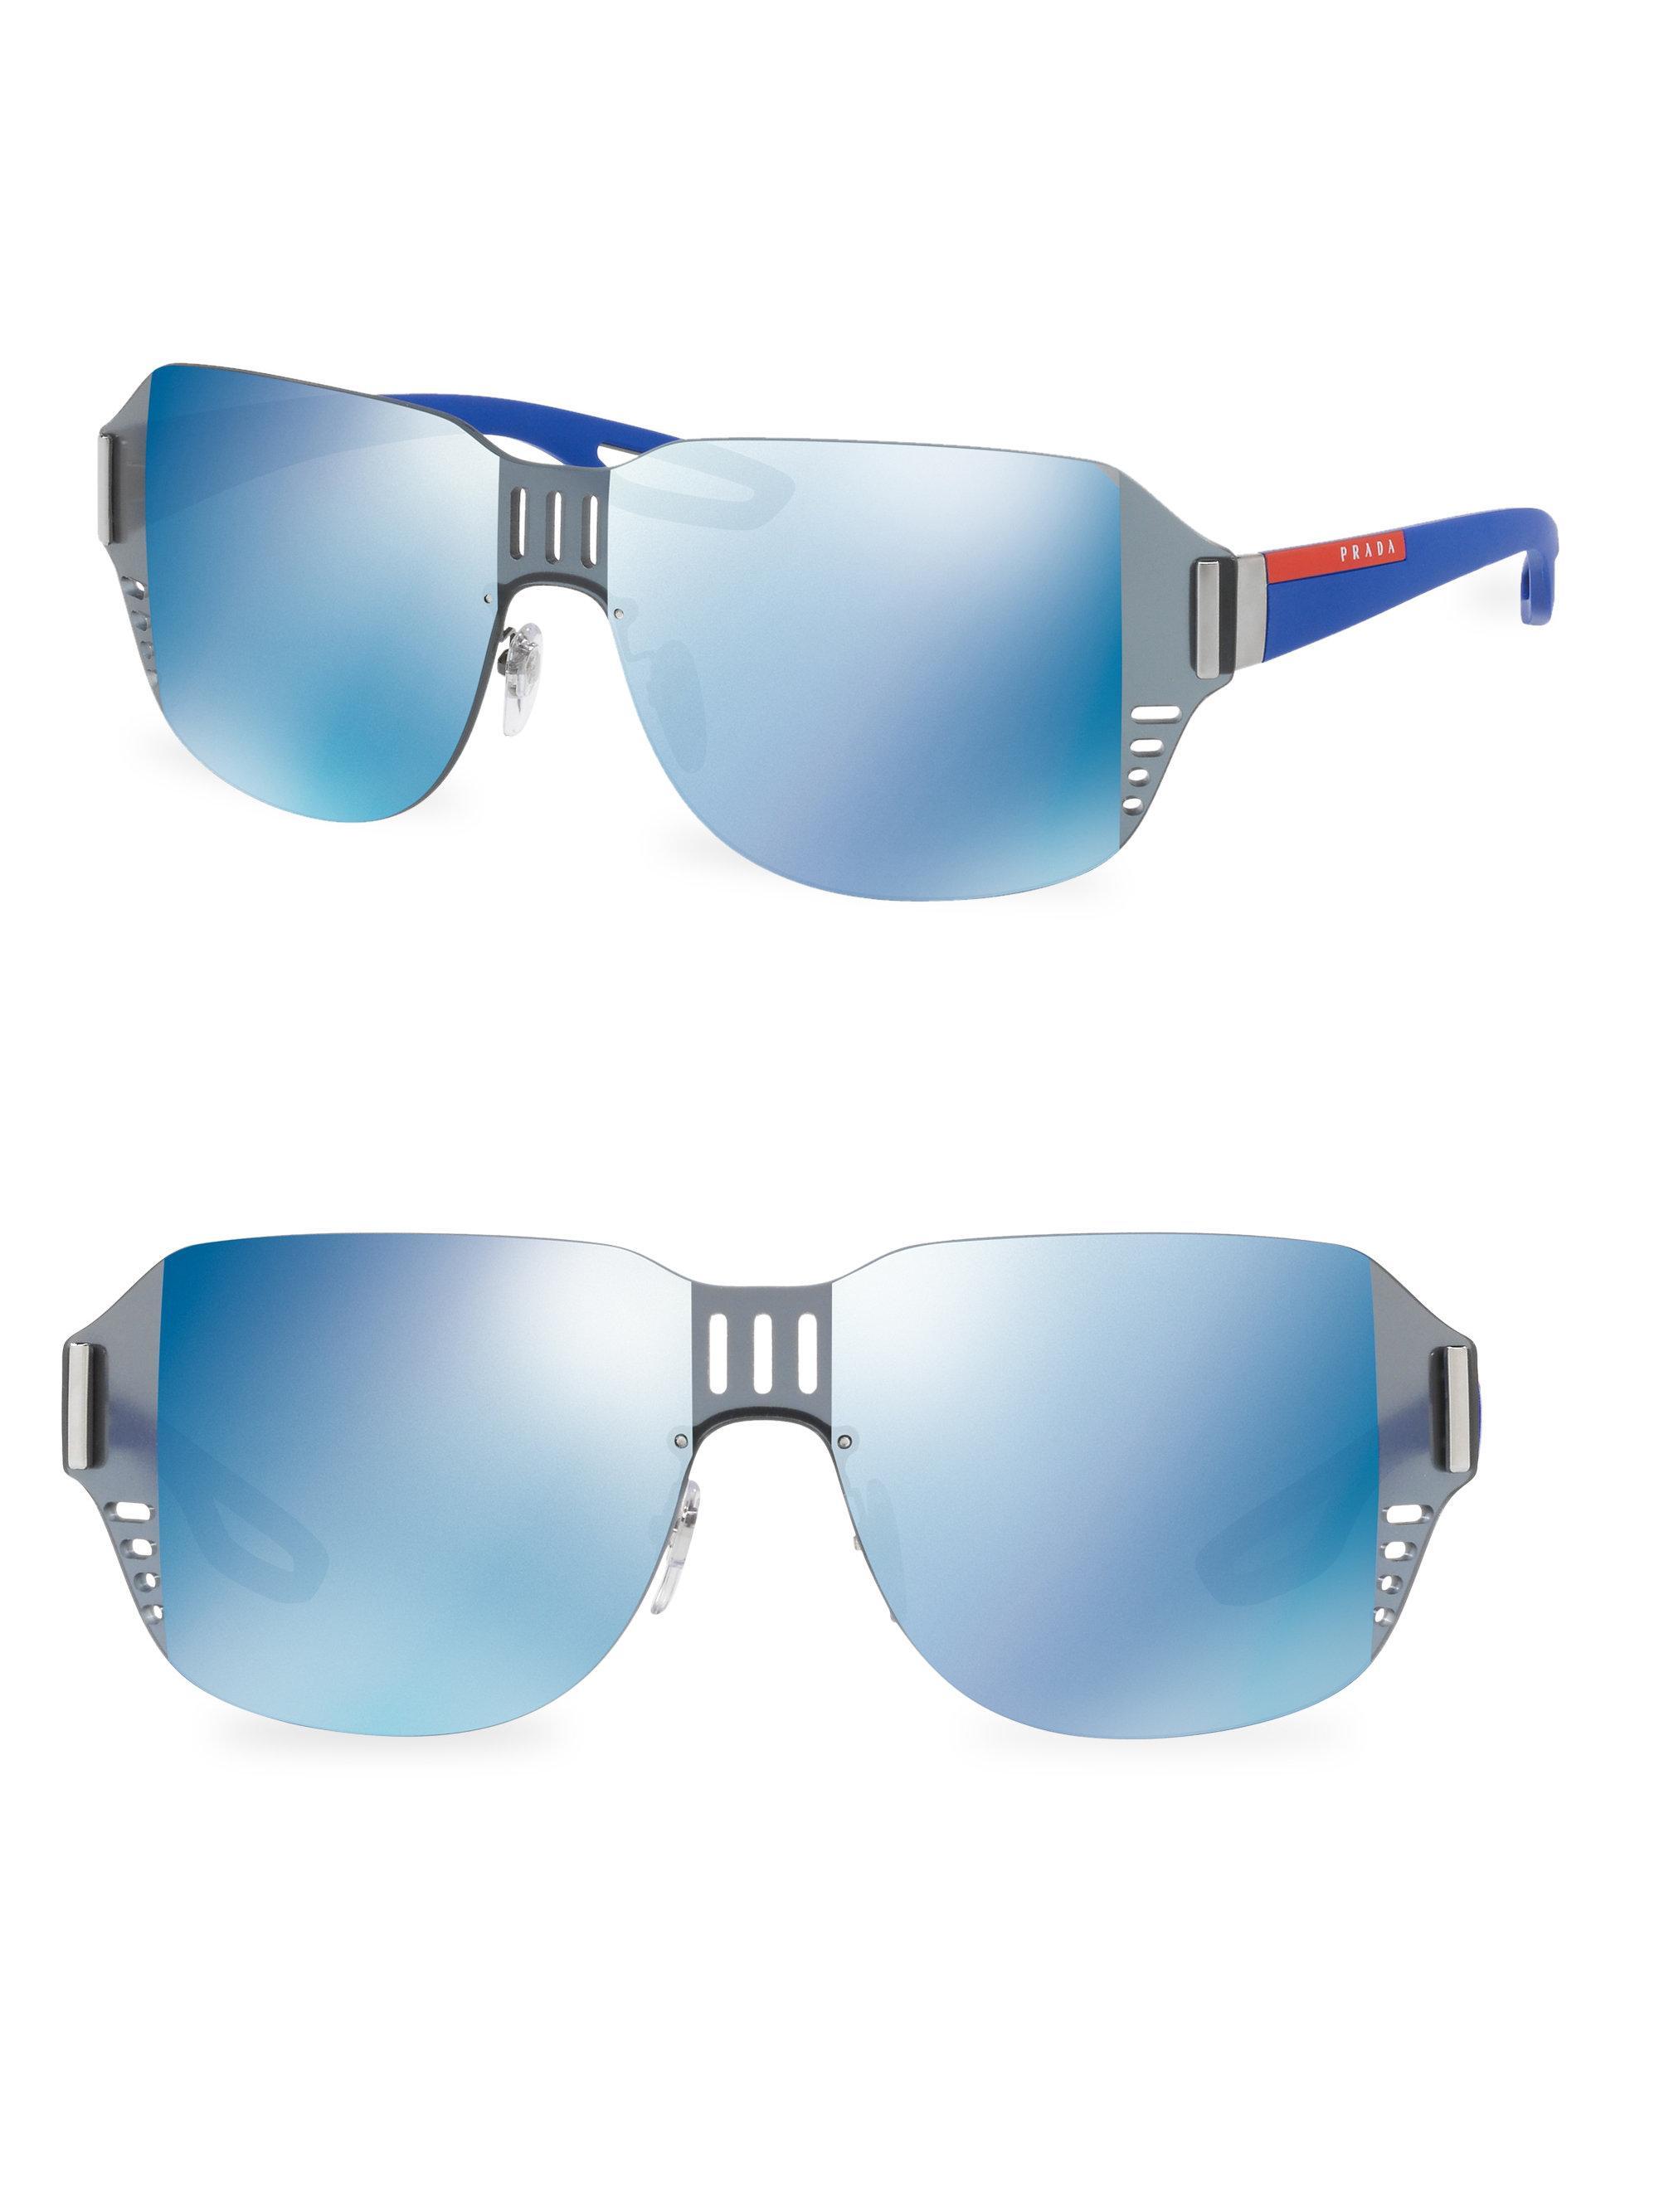 c4864bf31b3 closeout prada milano sunglasses unisex 8dca5 420a1  get lyst prada sport  mirrored shield sunglasses in blue c1c84 1ff77